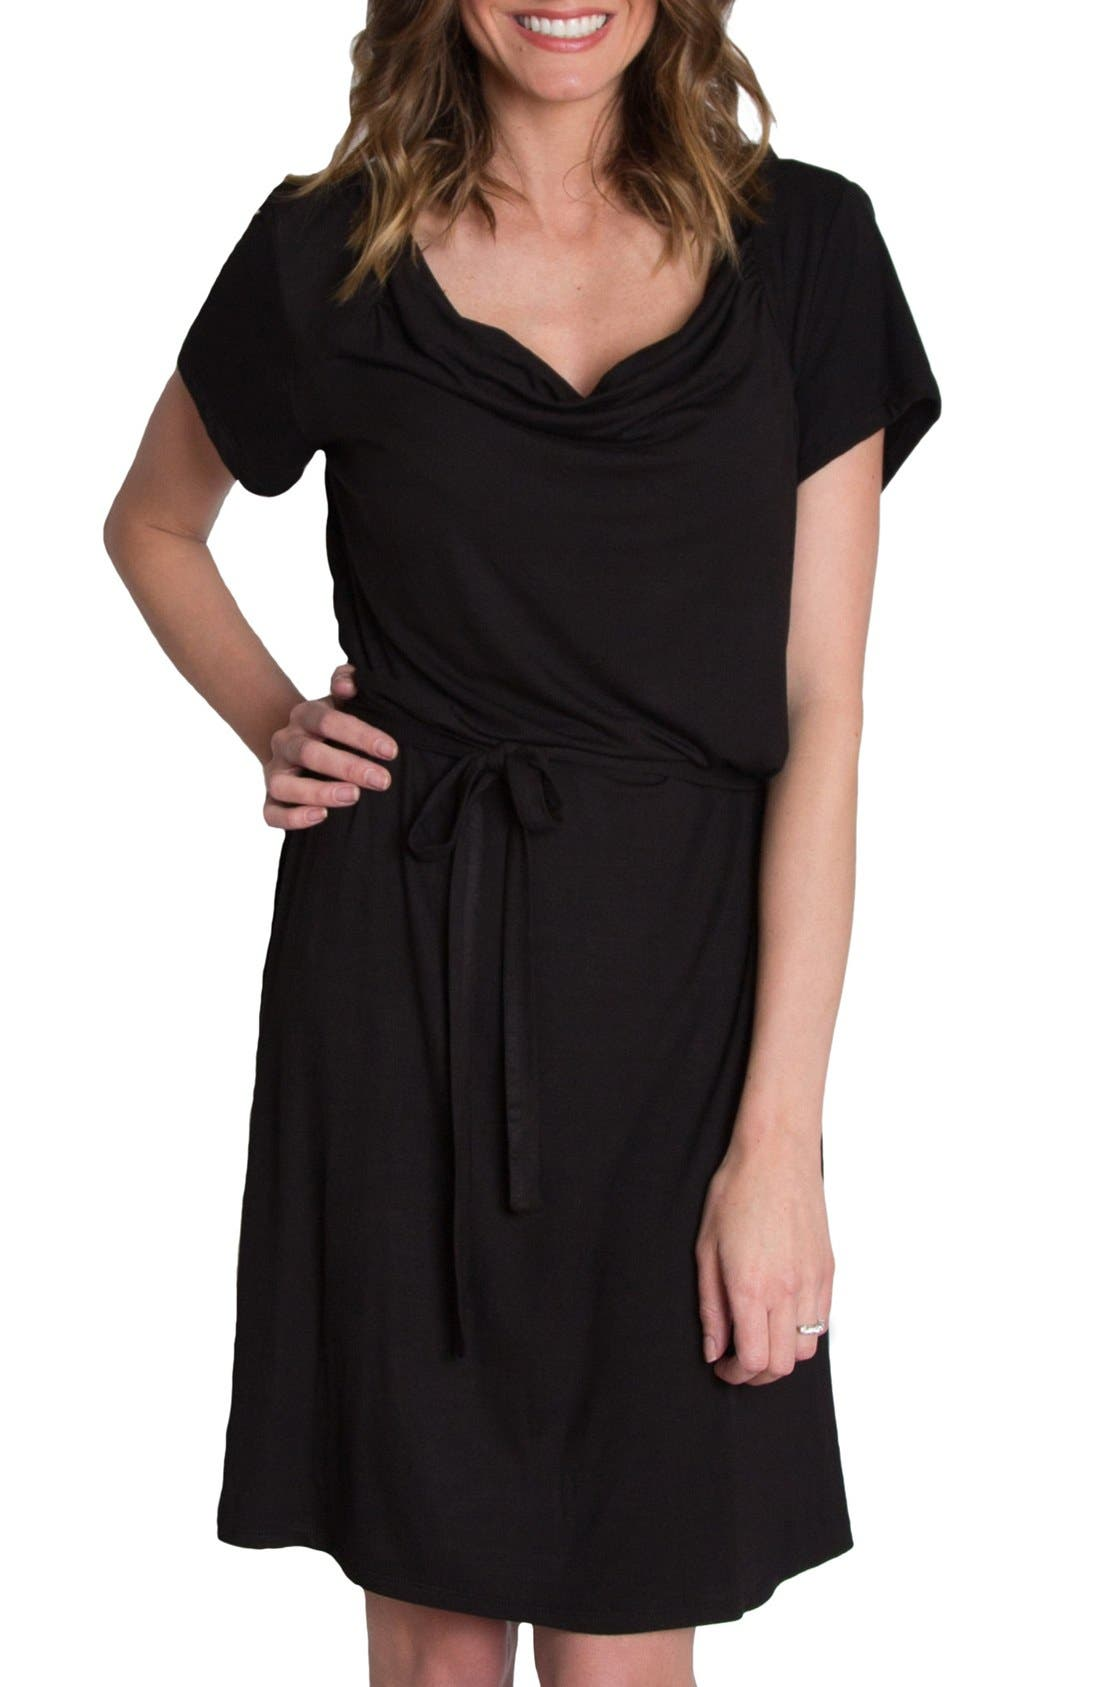 'Chic' Cowl Neck Nursing Dress,                             Main thumbnail 1, color,                             BLACK